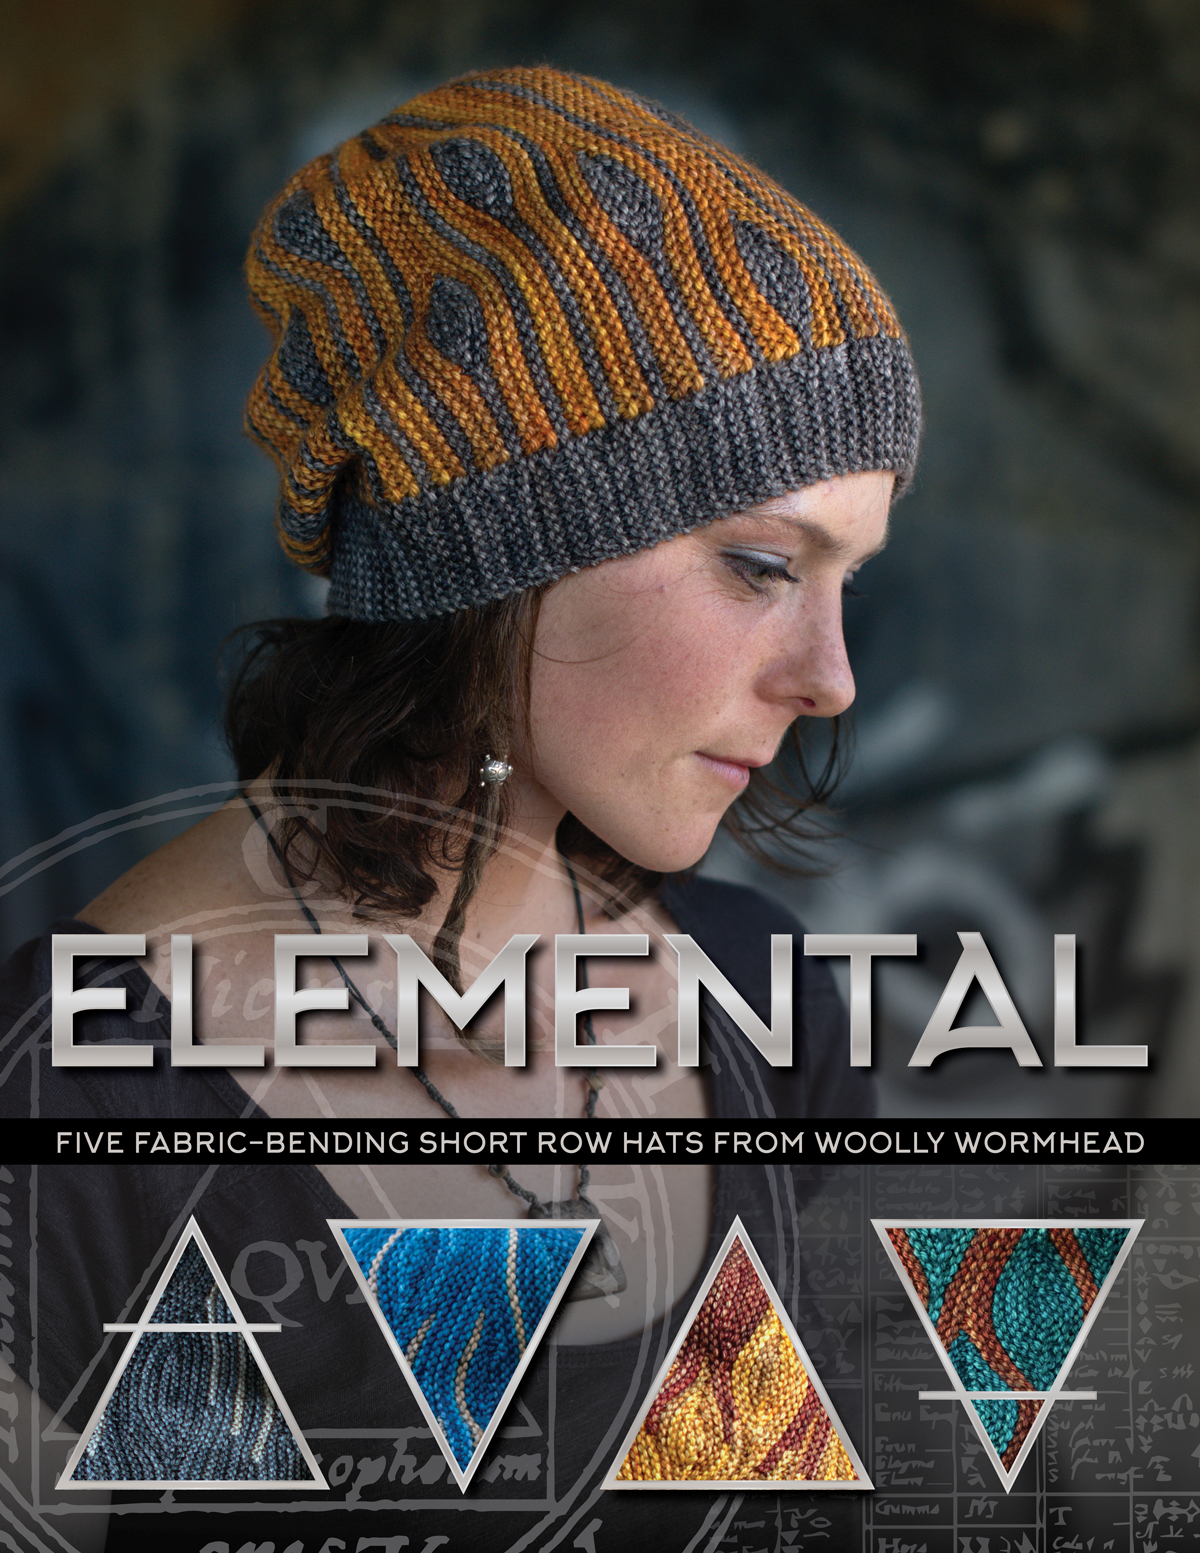 Elemental collection of sideways knit short row colourwork hats